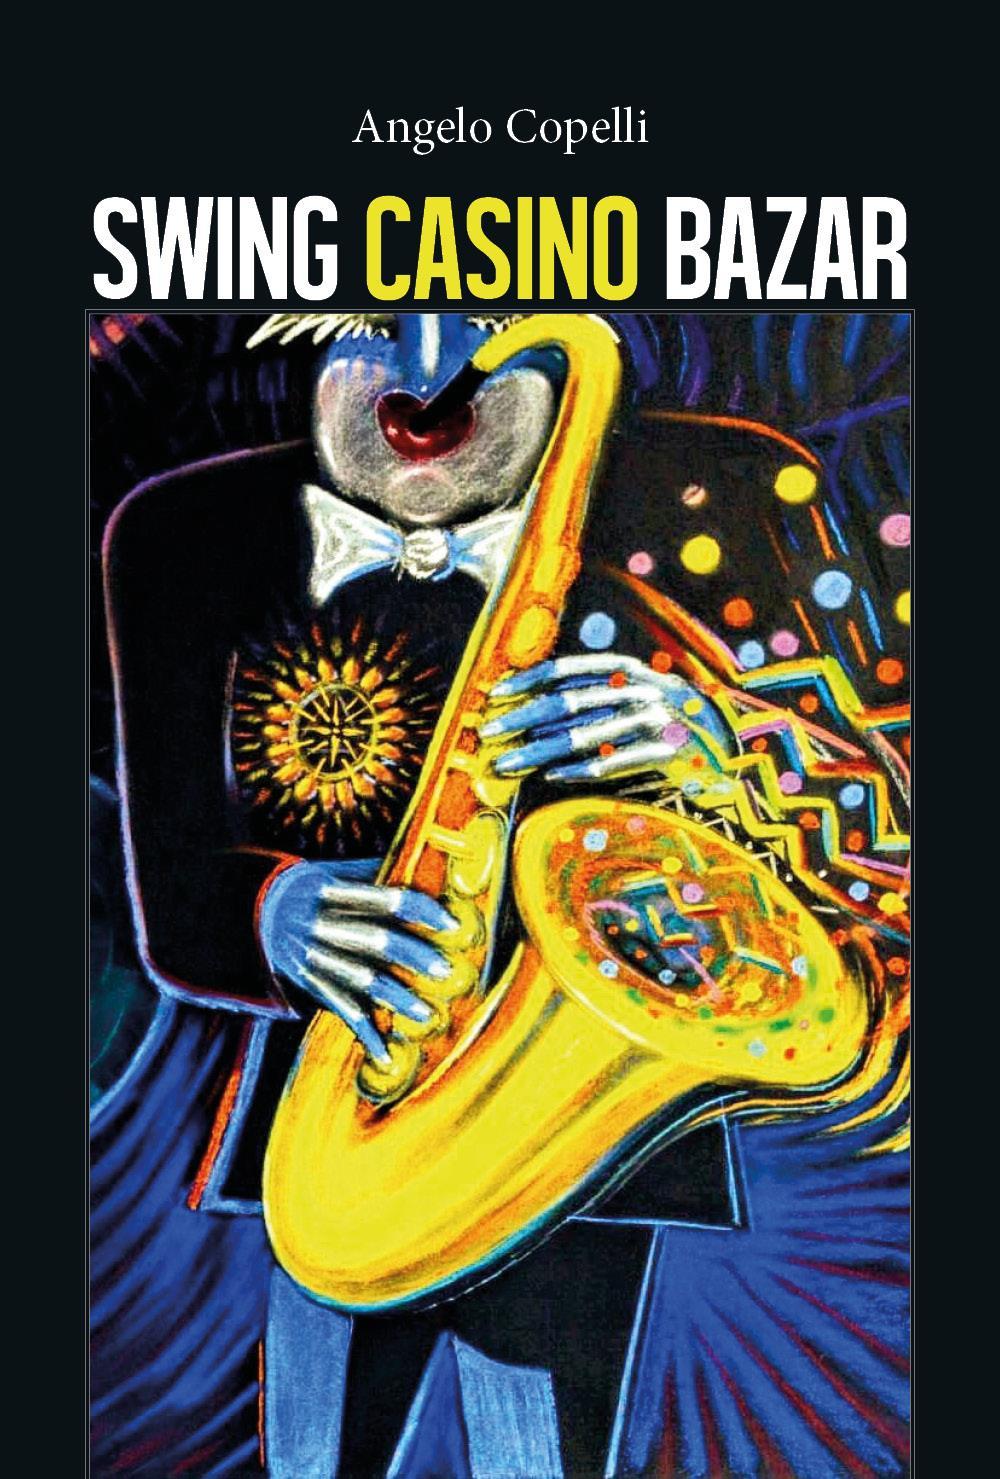 Swing casino bazar